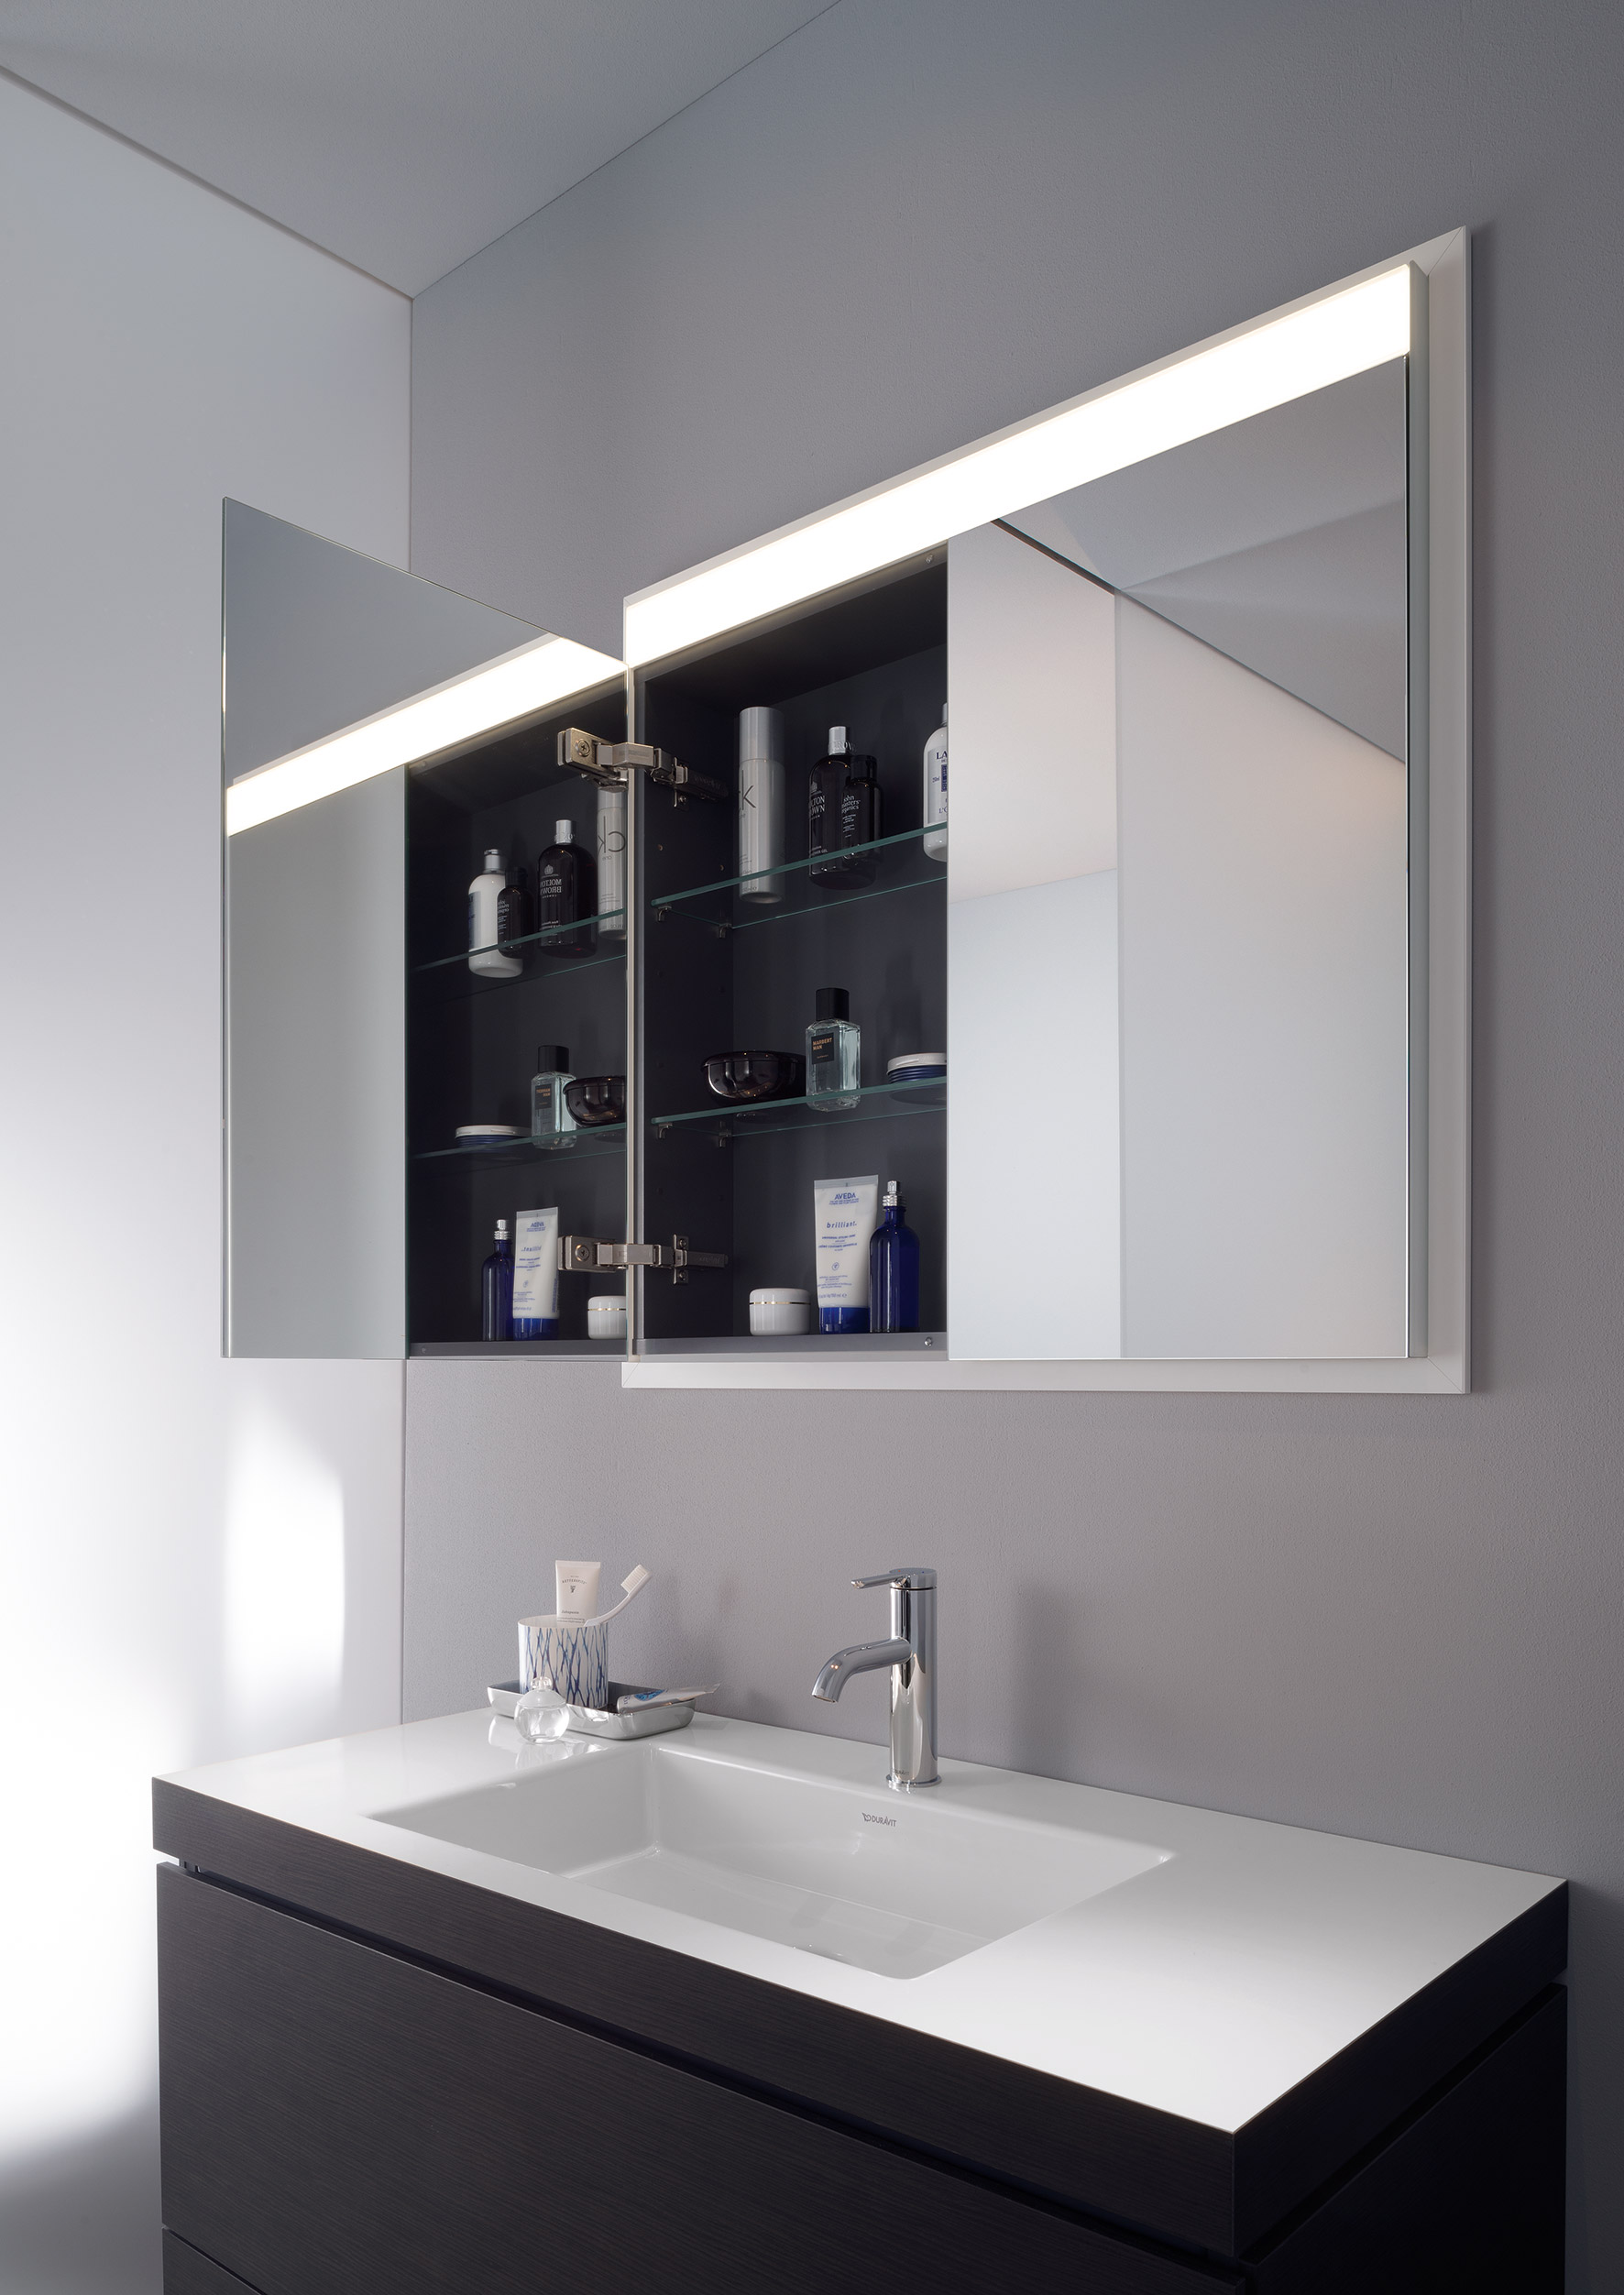 bathroom furniture from duravit duravit. Black Bedroom Furniture Sets. Home Design Ideas